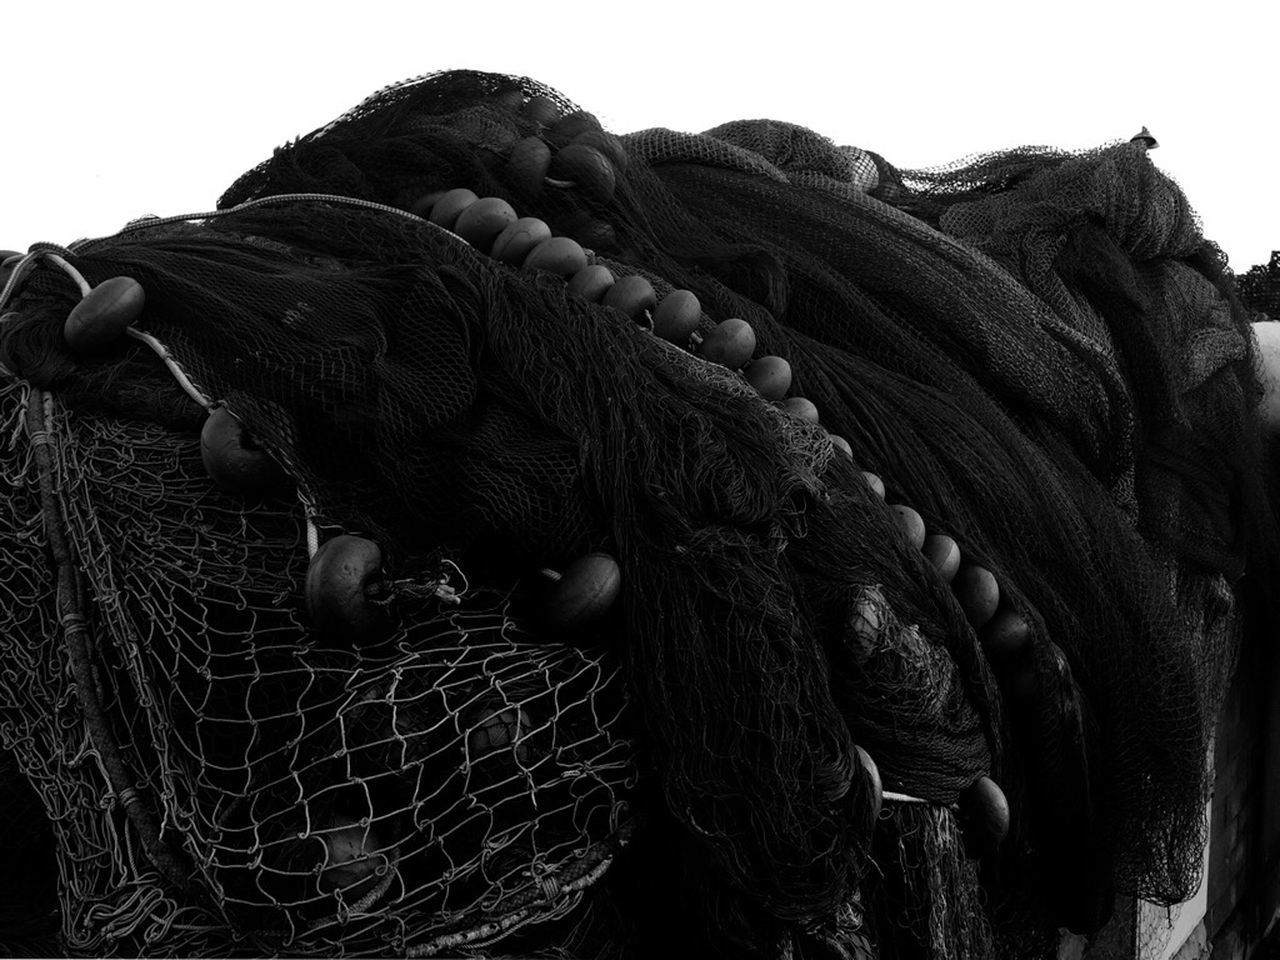 Napoli Italy Napoli Pescatori Details Vincenzo Improta Photographer Biancoenero Whiteblack Whiteblackphotography Holiday Photography Campania Photo Marigliano Details Of My Life Life Lifeisbeautiful Reti Pesca Mare Sole Sunset Sun Summer